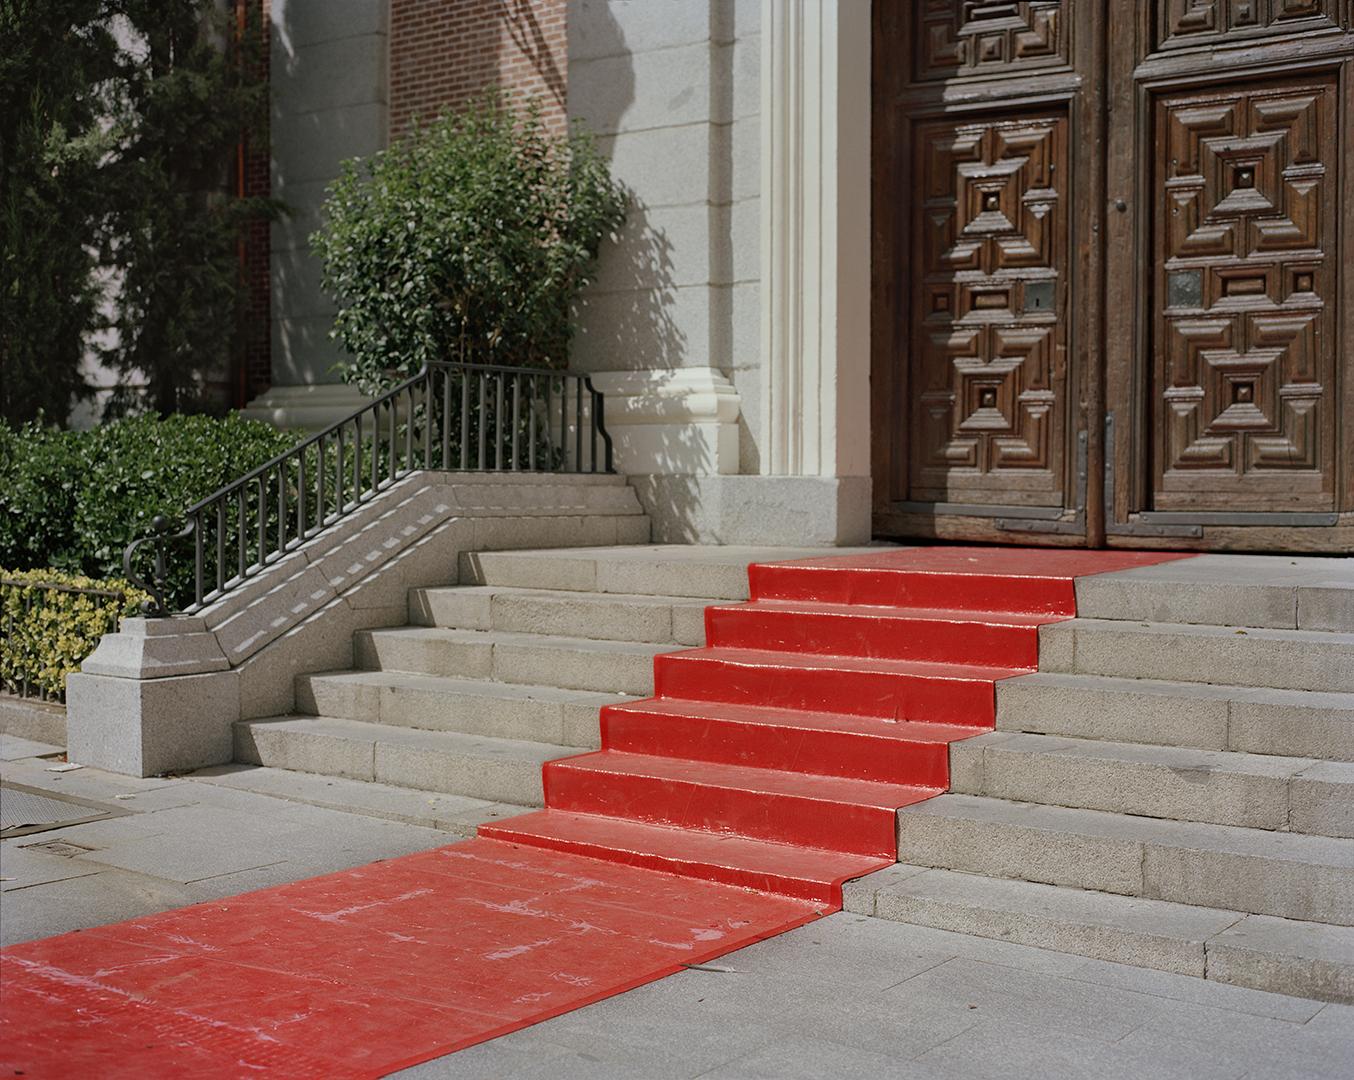 Red Carpet, 2014